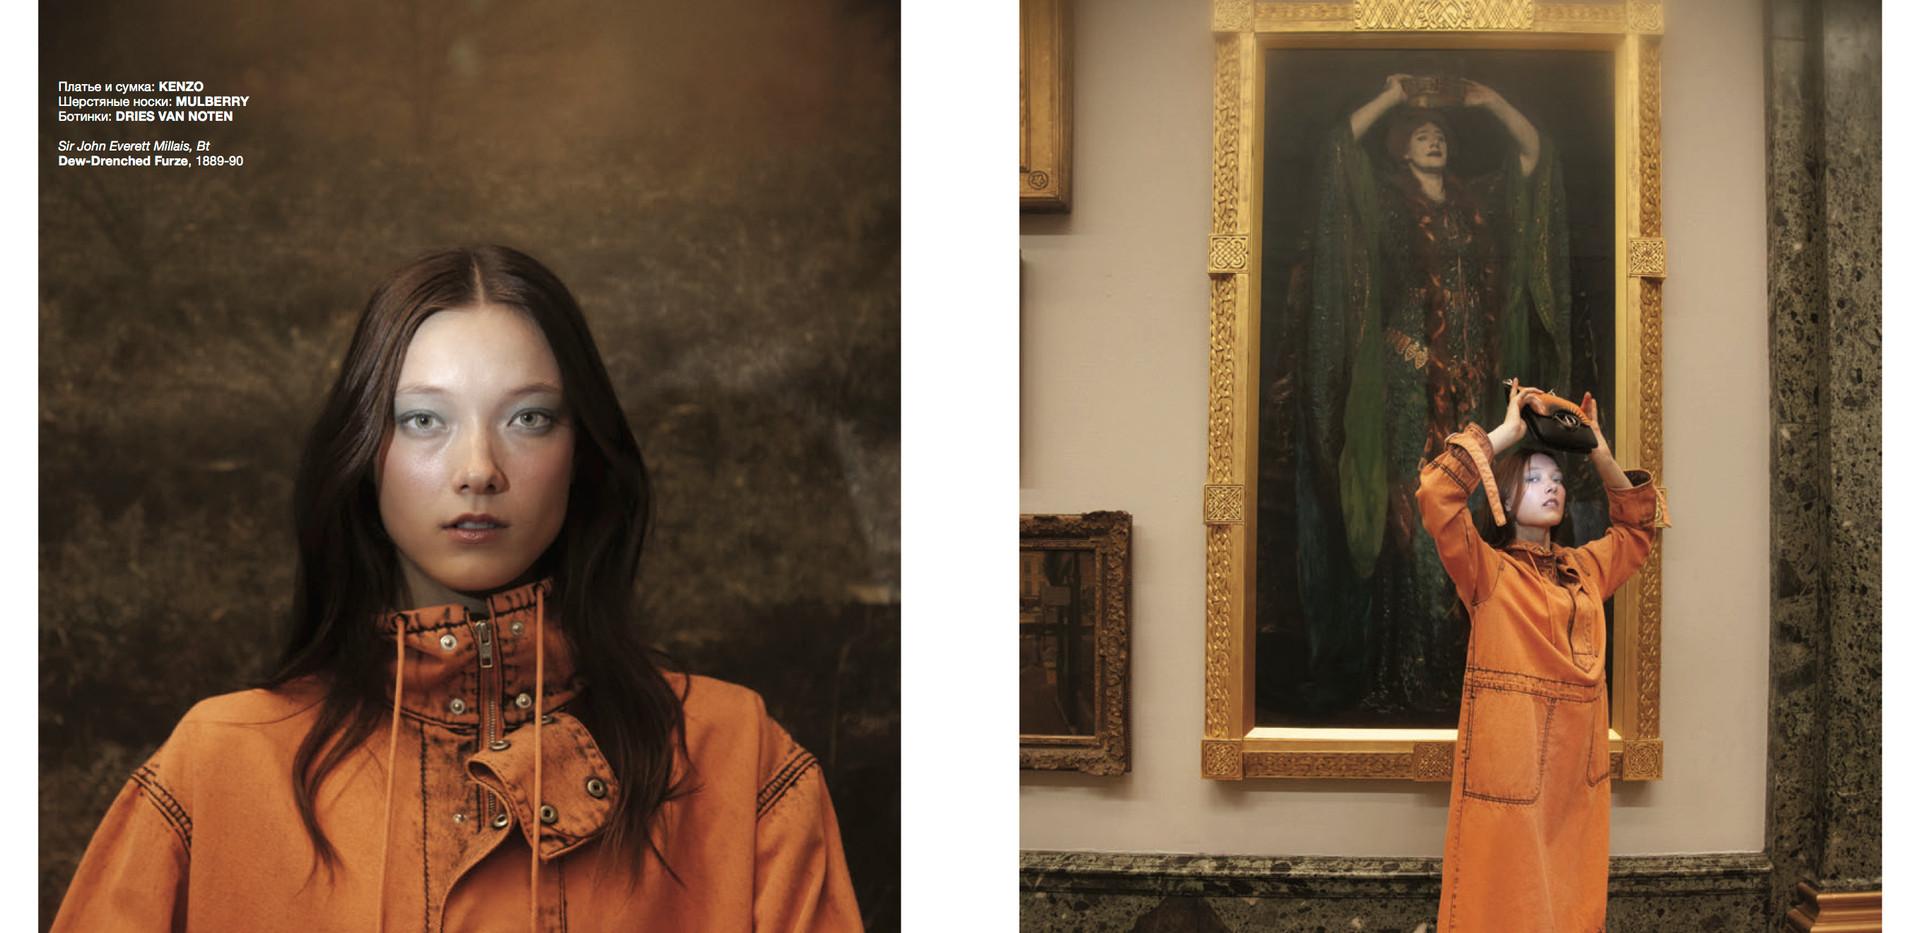 NUMERO RUSSIA 055 WOMEN EMPOWERMENT   PHOTO AND CREATIVE DIRECTOR: WANDA MARTIN  STYLIST: NATALIA PAKU SUKUDA  MAKE UP: KENTARO KONDO  USING SUQQU  HAIR: MIKE O'GORMAN USING WELLA PROFESSIONALS  PHOTOGRAPHER'S ASSISTANT: PANNA DONKA  STYLIST'S ASSISTANT: KATHERINE LO